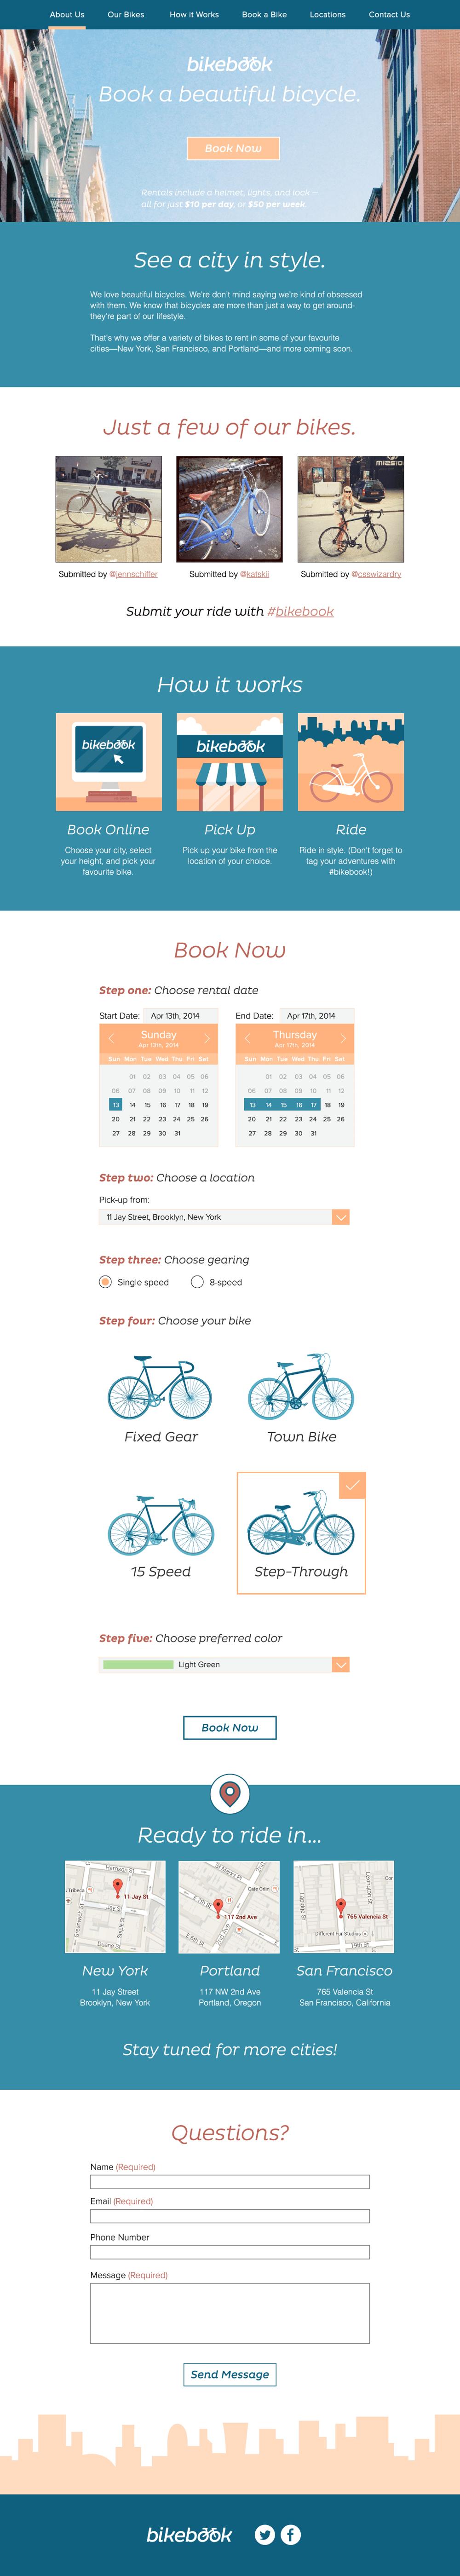 Bikebook Website - image 3 - student project